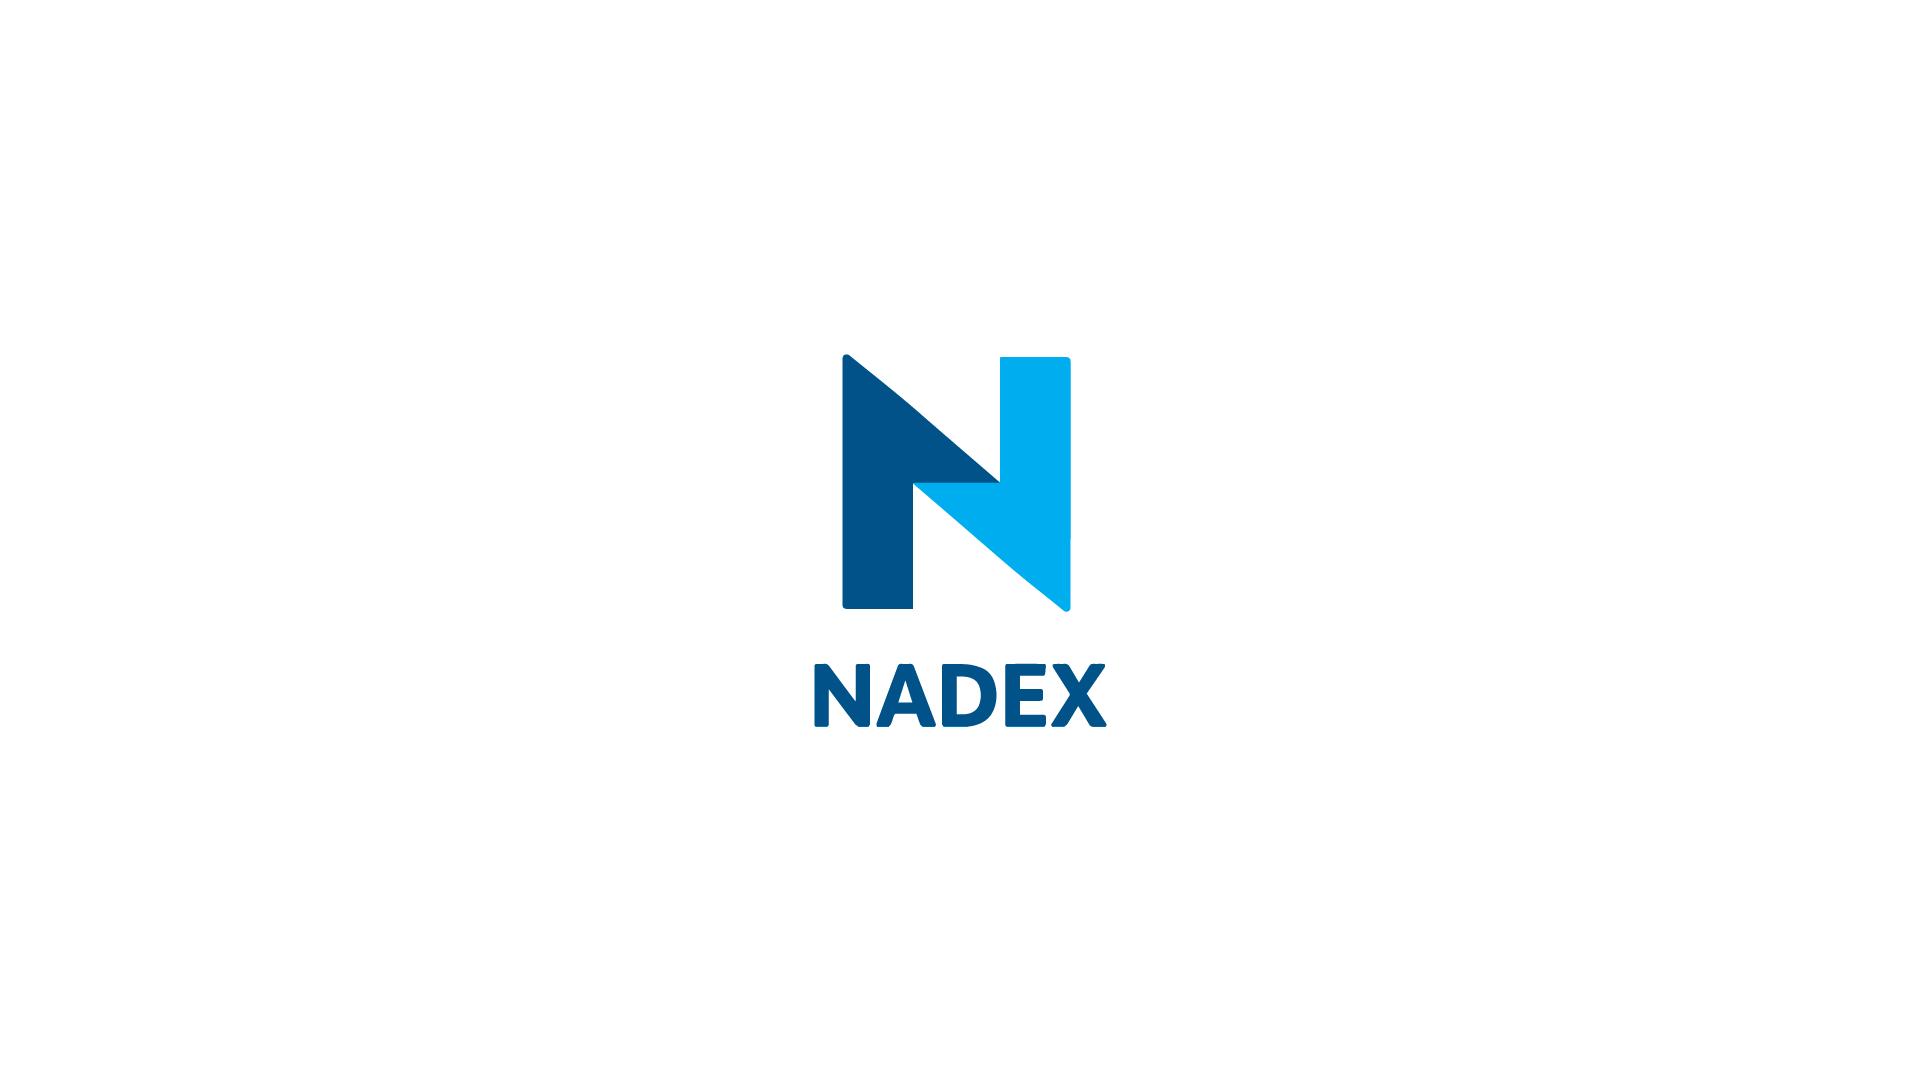 Binary options trading signals nadex complaints galatasaray vs sivasspor betting tips